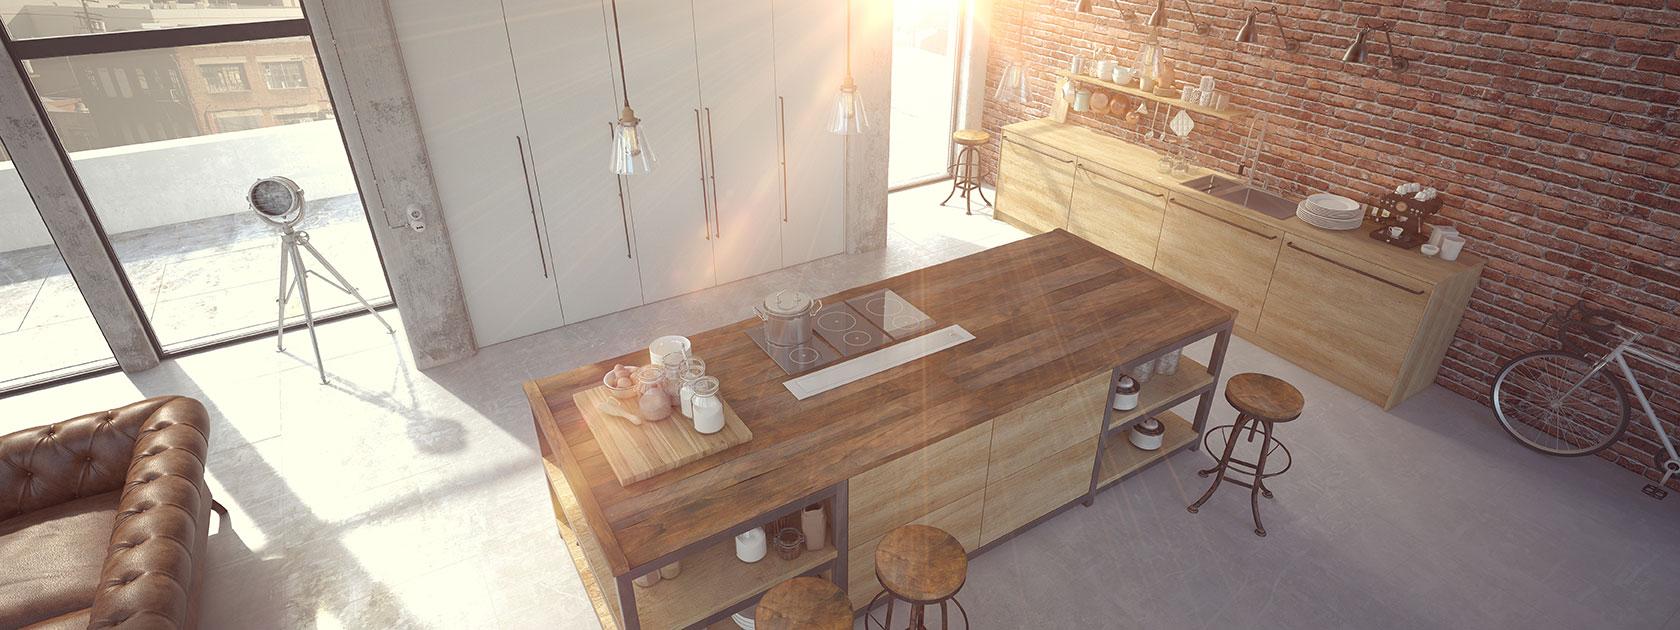 offres d emploi redange int rieur. Black Bedroom Furniture Sets. Home Design Ideas